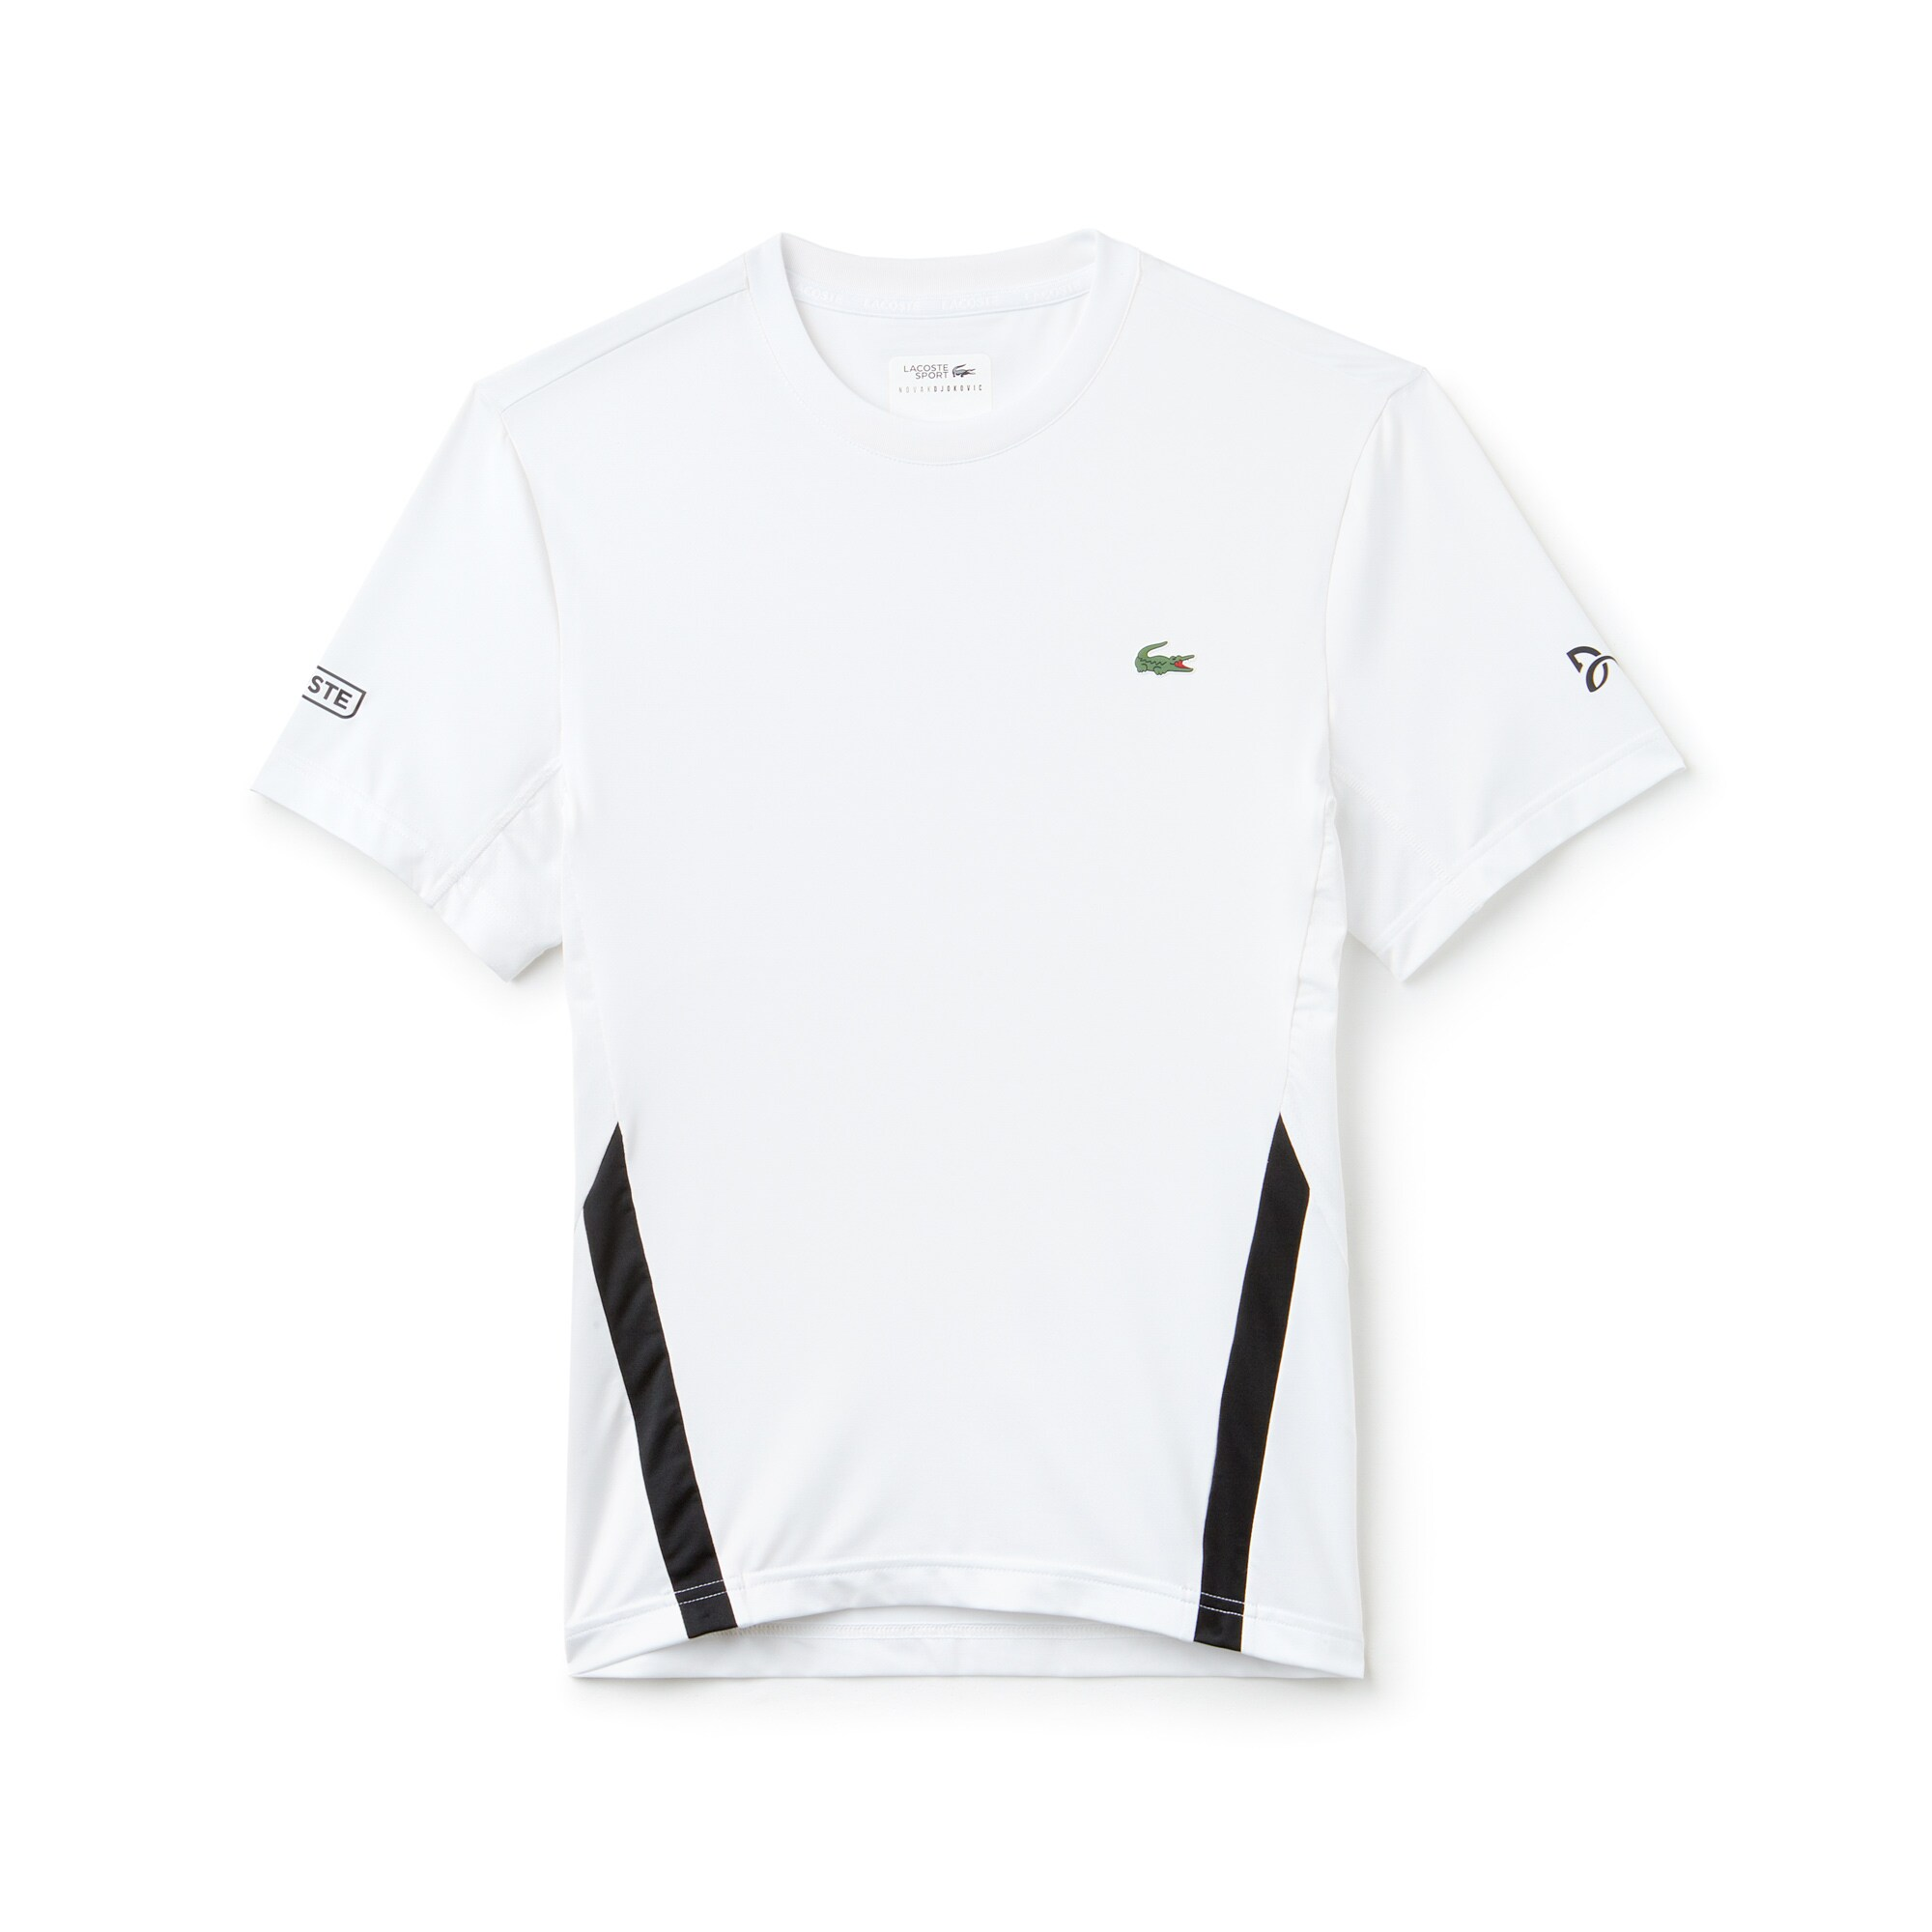 Lacoste SPORT NOVAK DJOKOVIC-OFF COURT COLLECTION-T-shirt heren ronde hals technische jersey met stretch